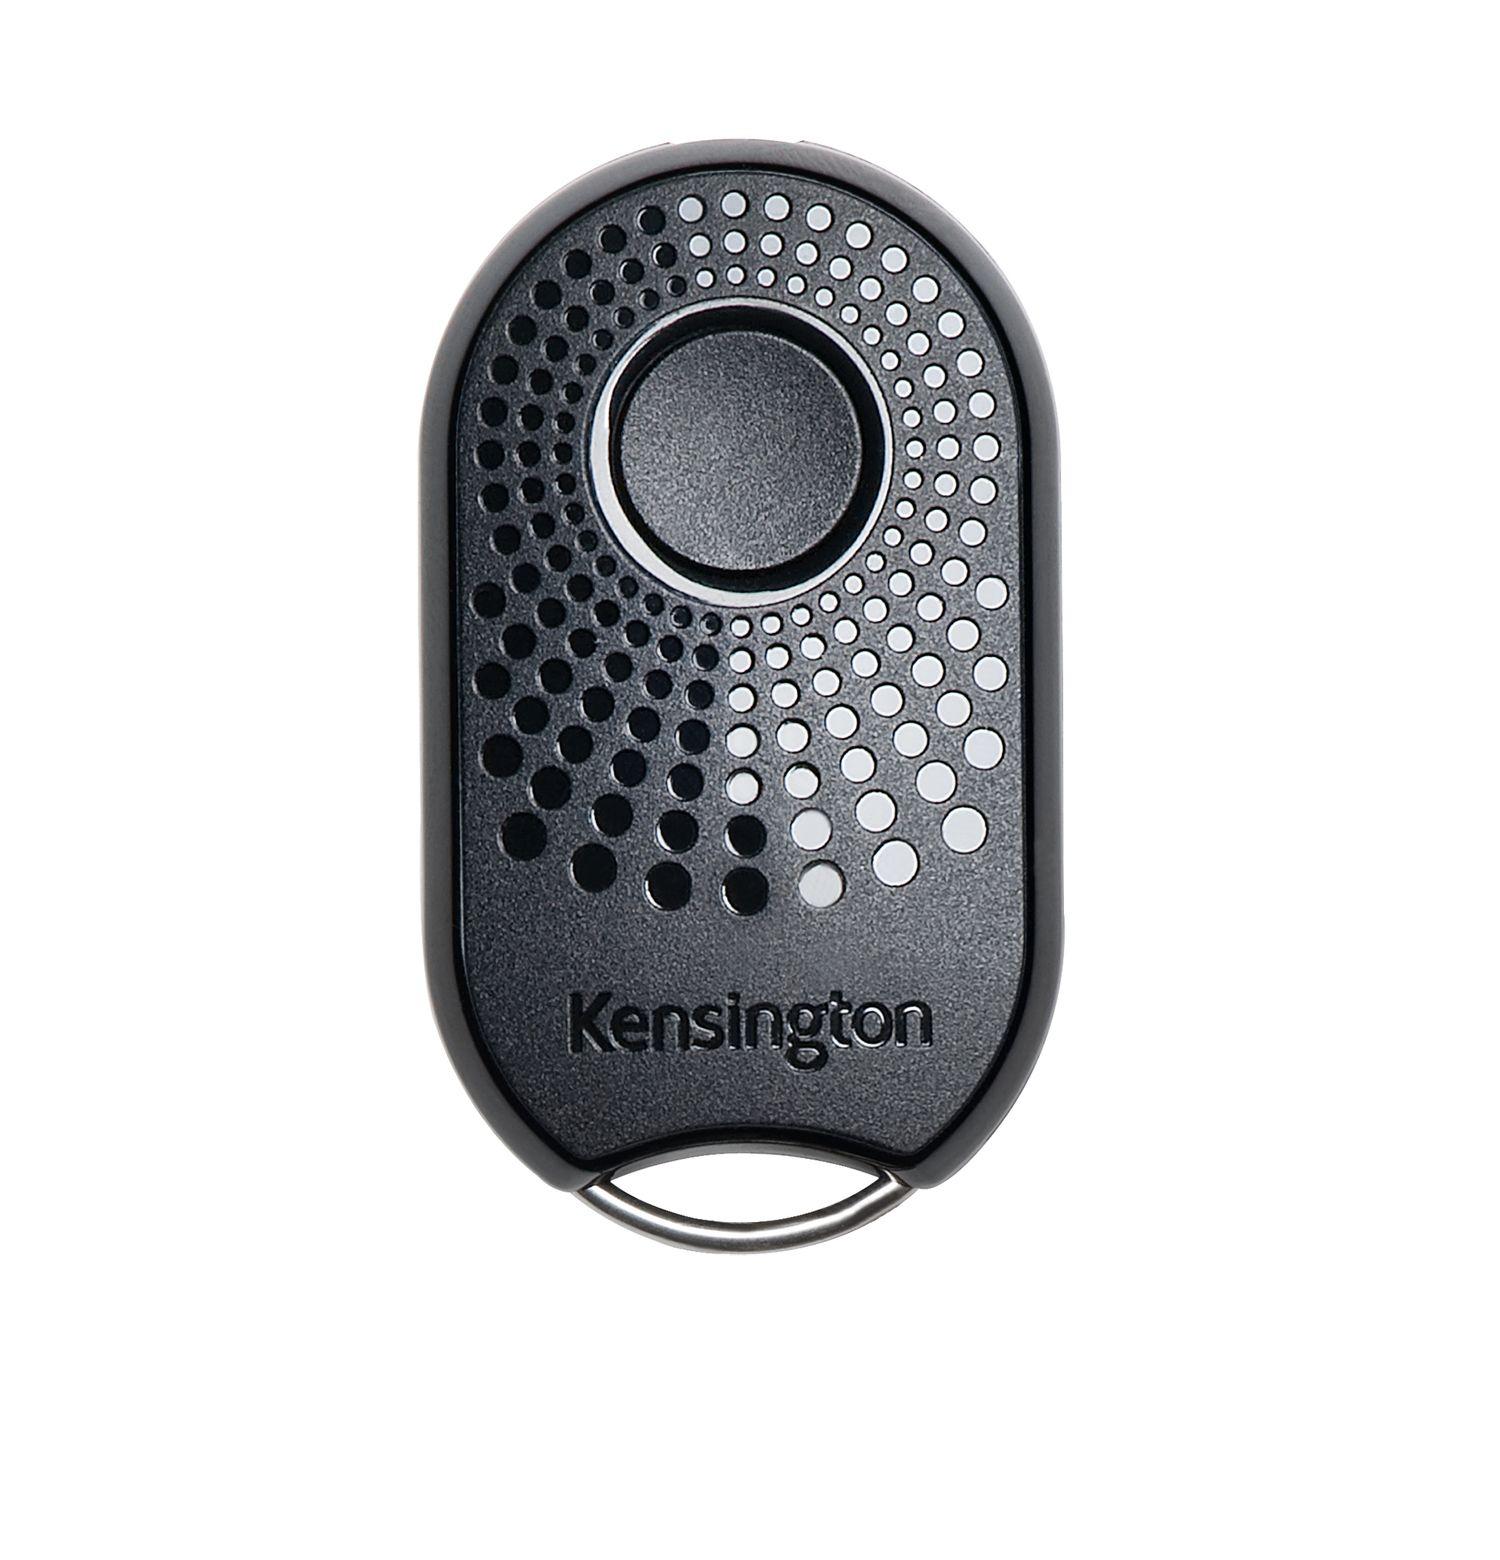 Kensington Proximo Key FOB - Nie mehr Angst um Wertsachen